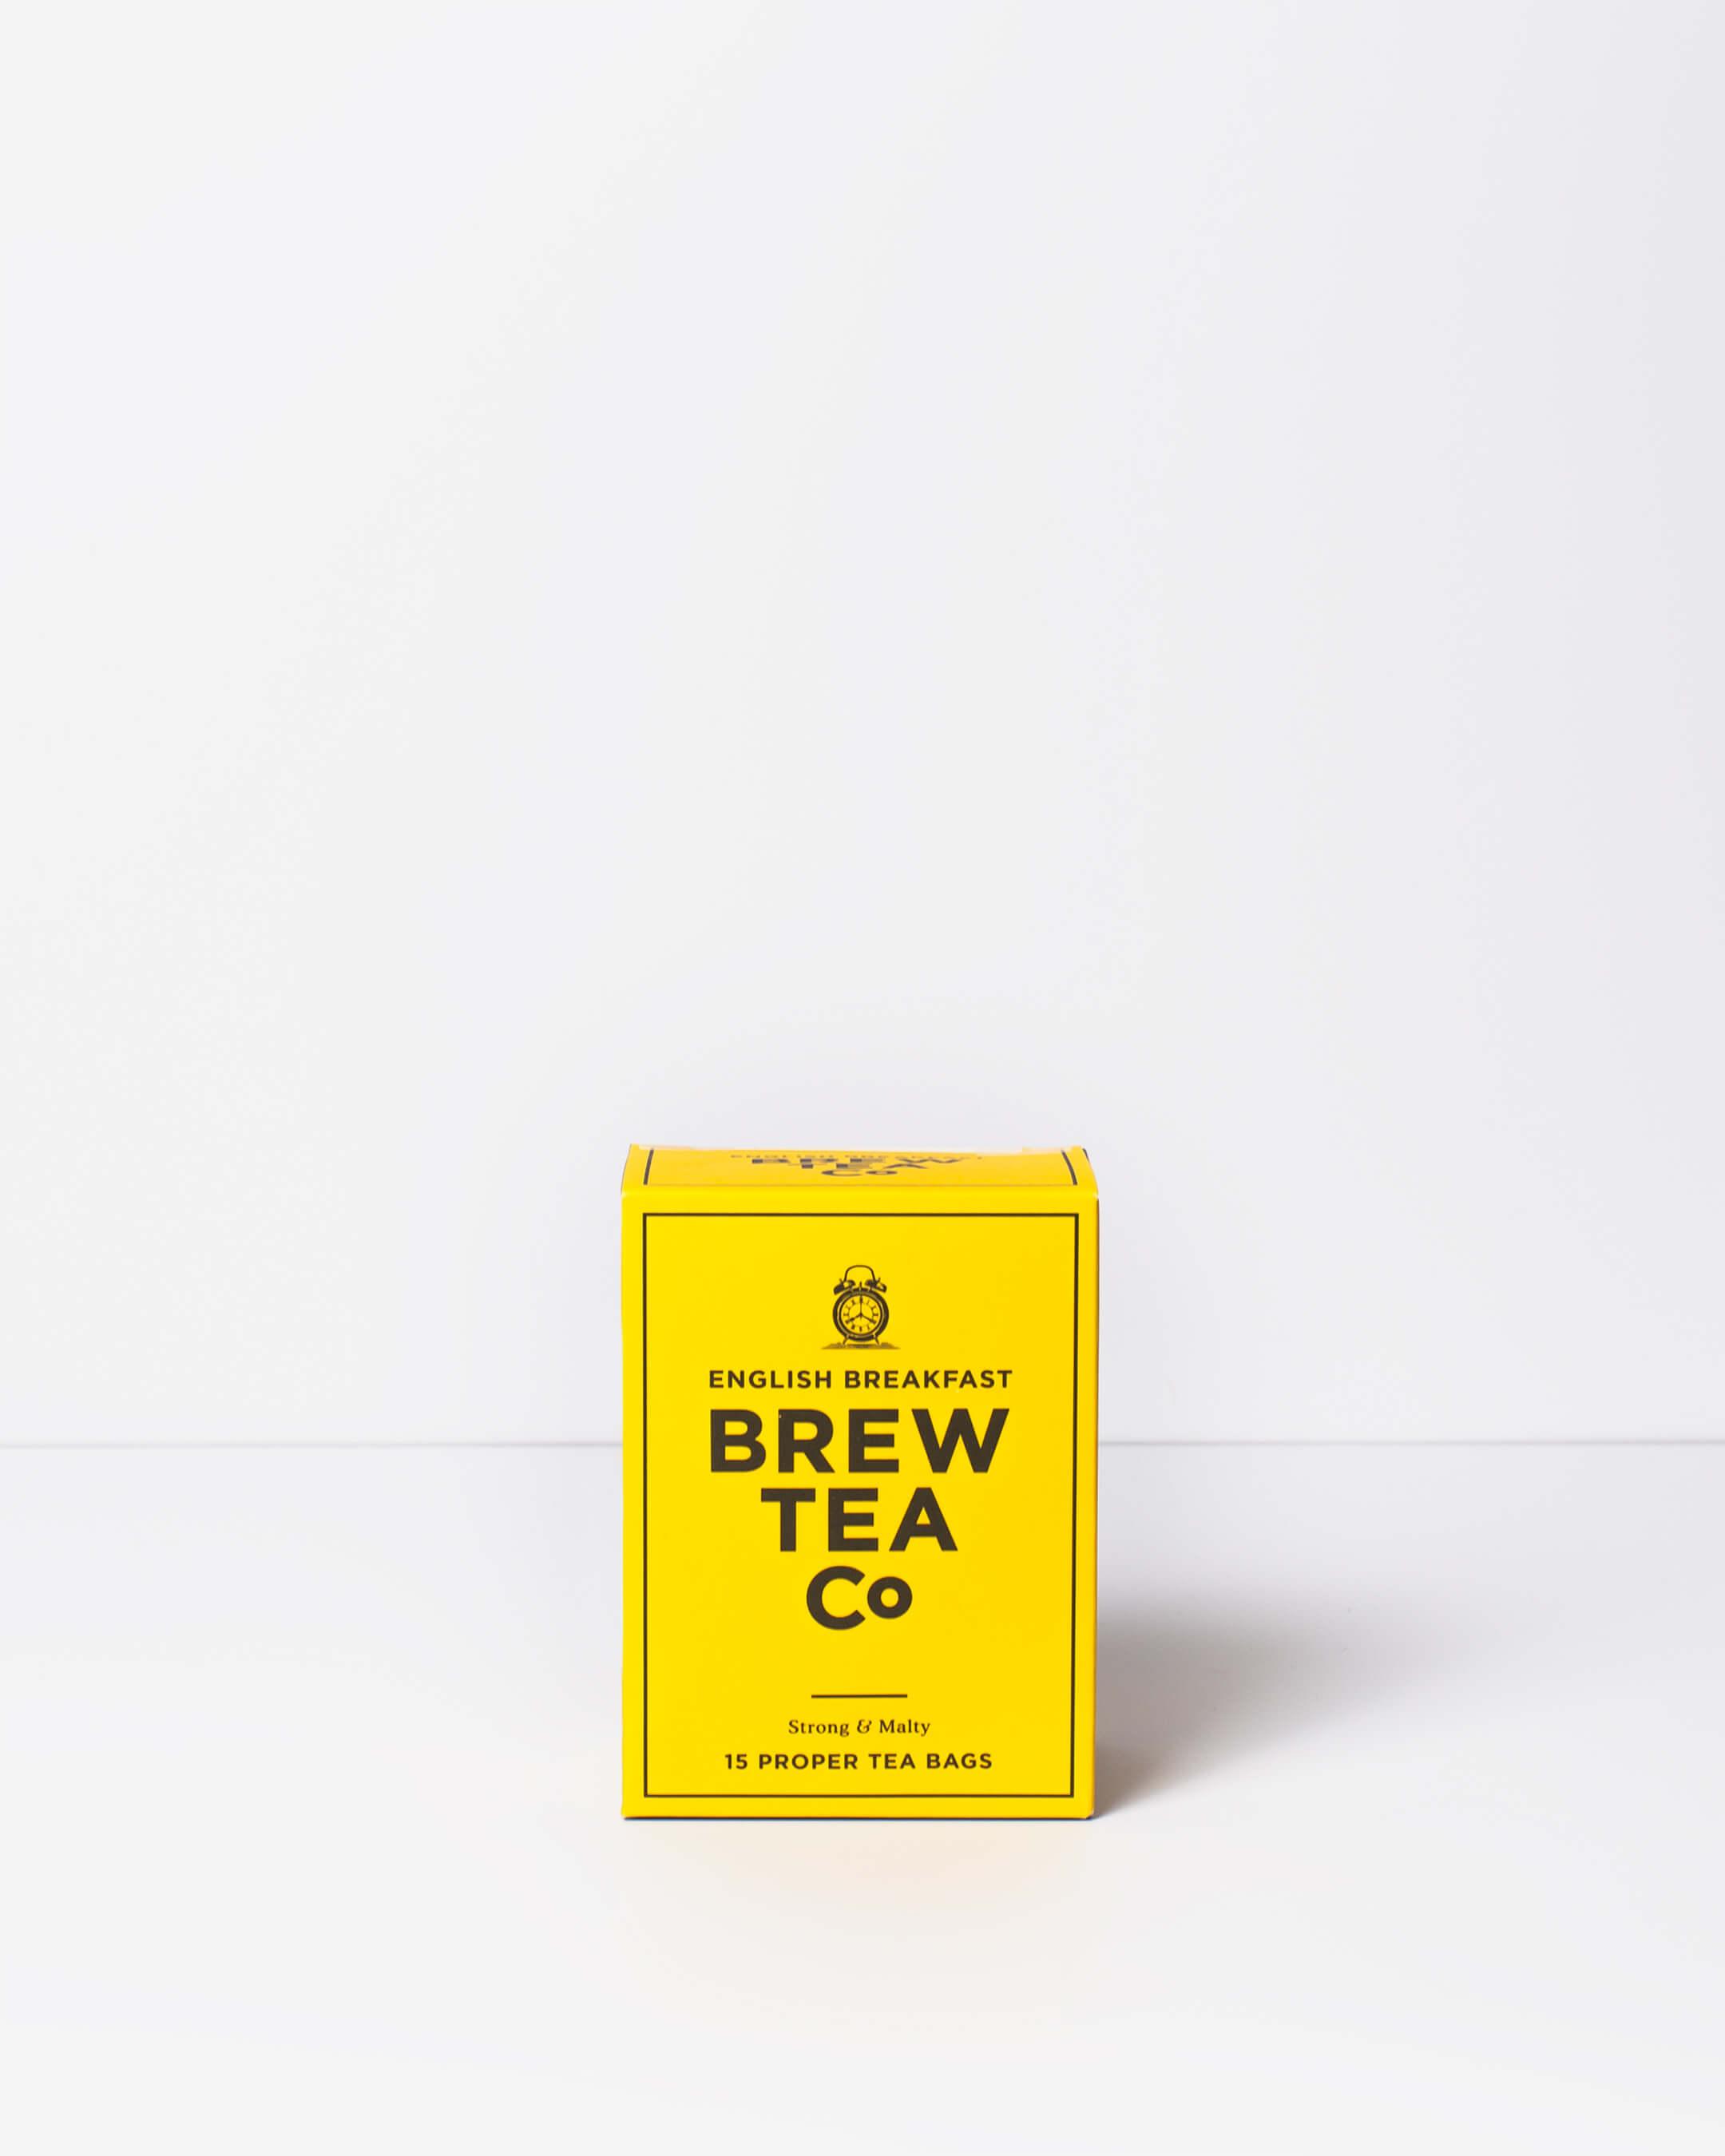 Brew Tea Co. breakfast tea box